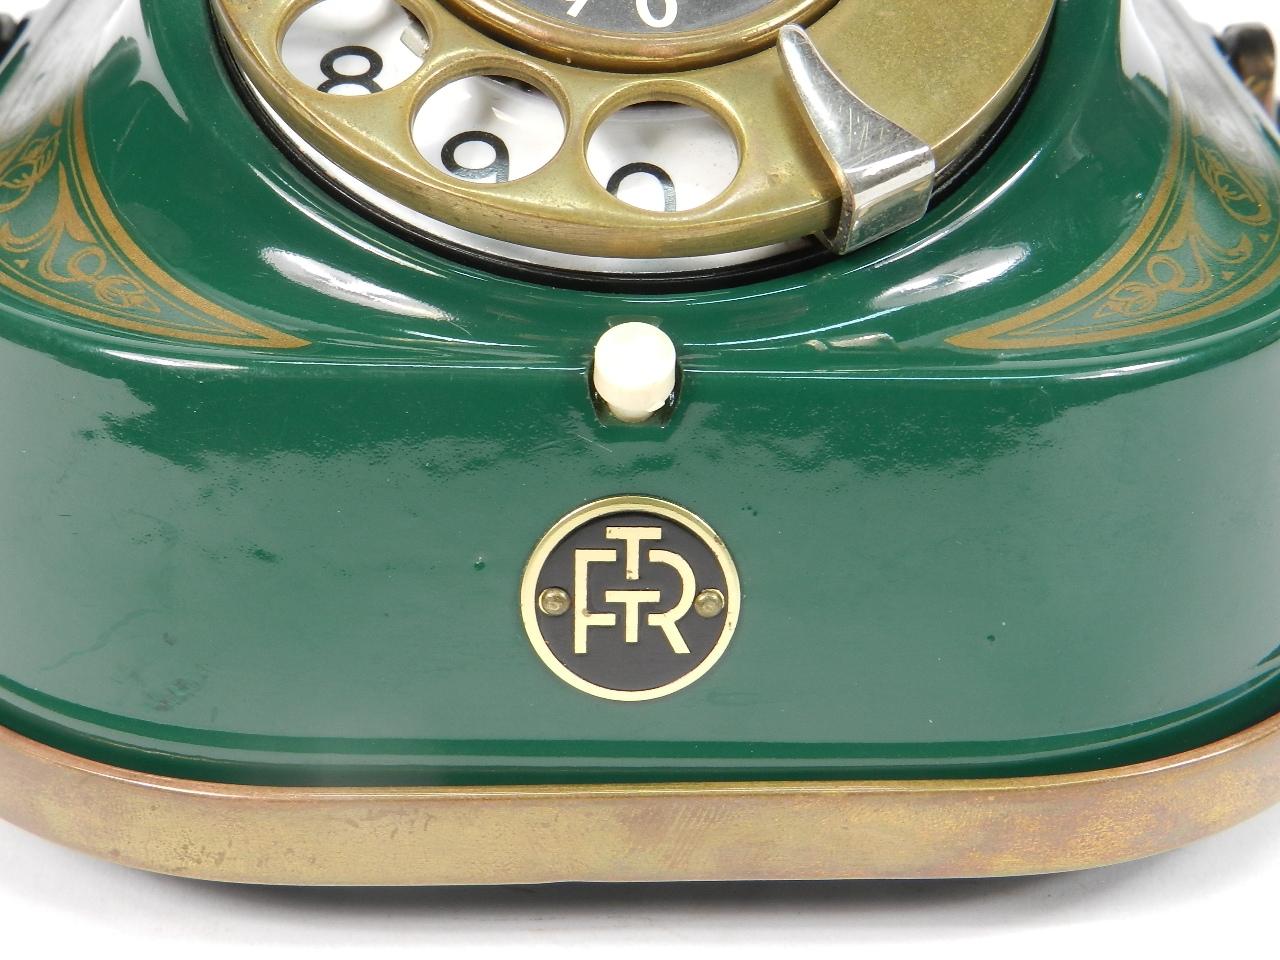 Imagen BELL TELEPHONE Cº  AÑO 1940, BELGICA 41397